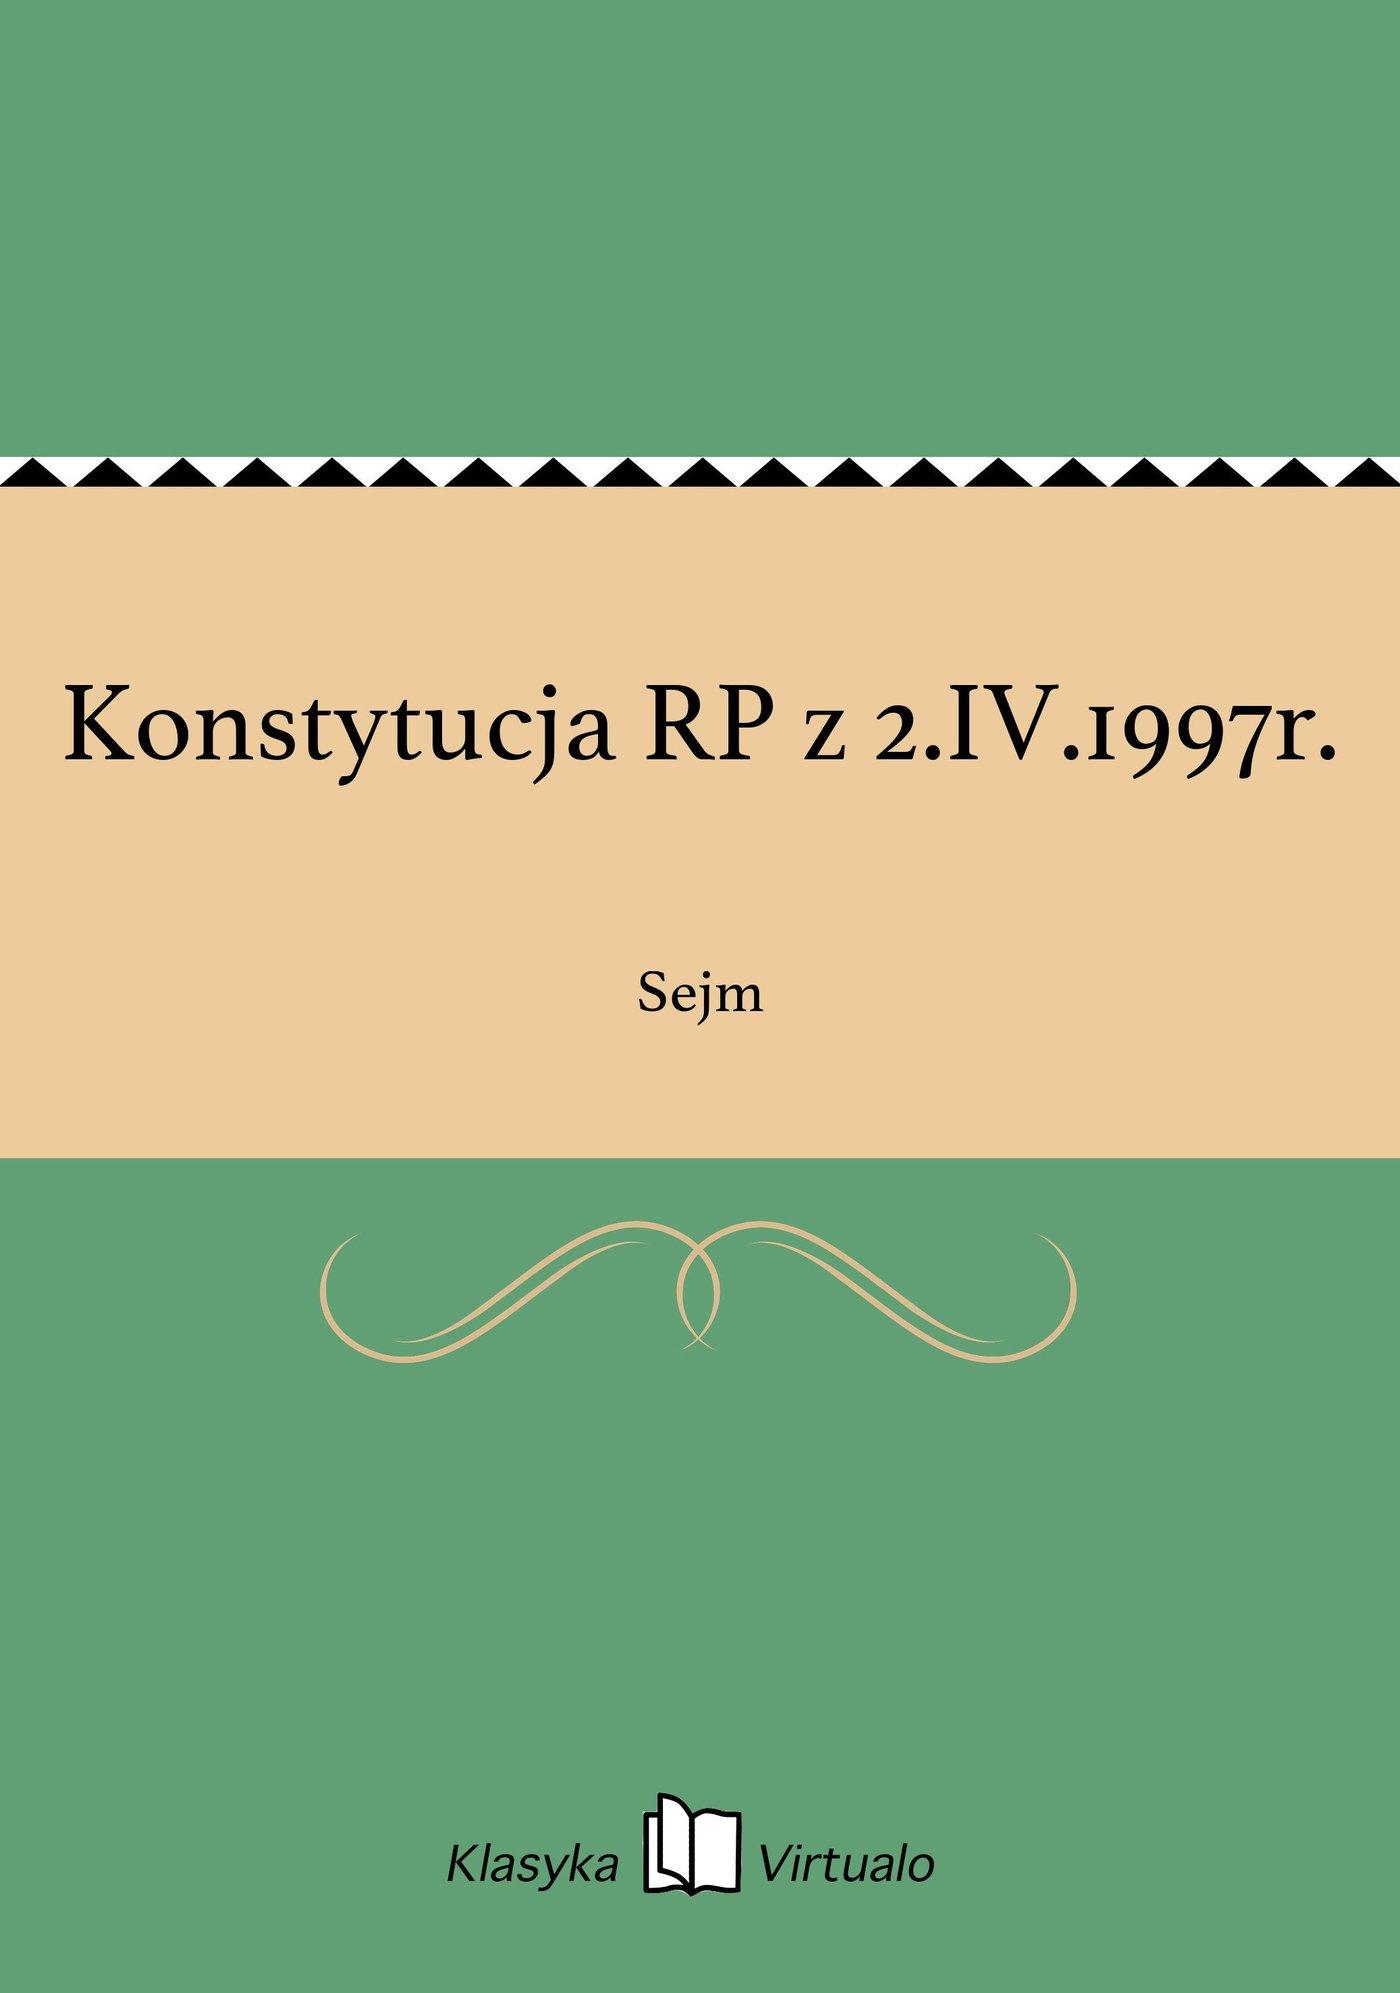 Konstytucja RP z 2.IV.1997r. - Ebook (Książka EPUB) do pobrania w formacie EPUB